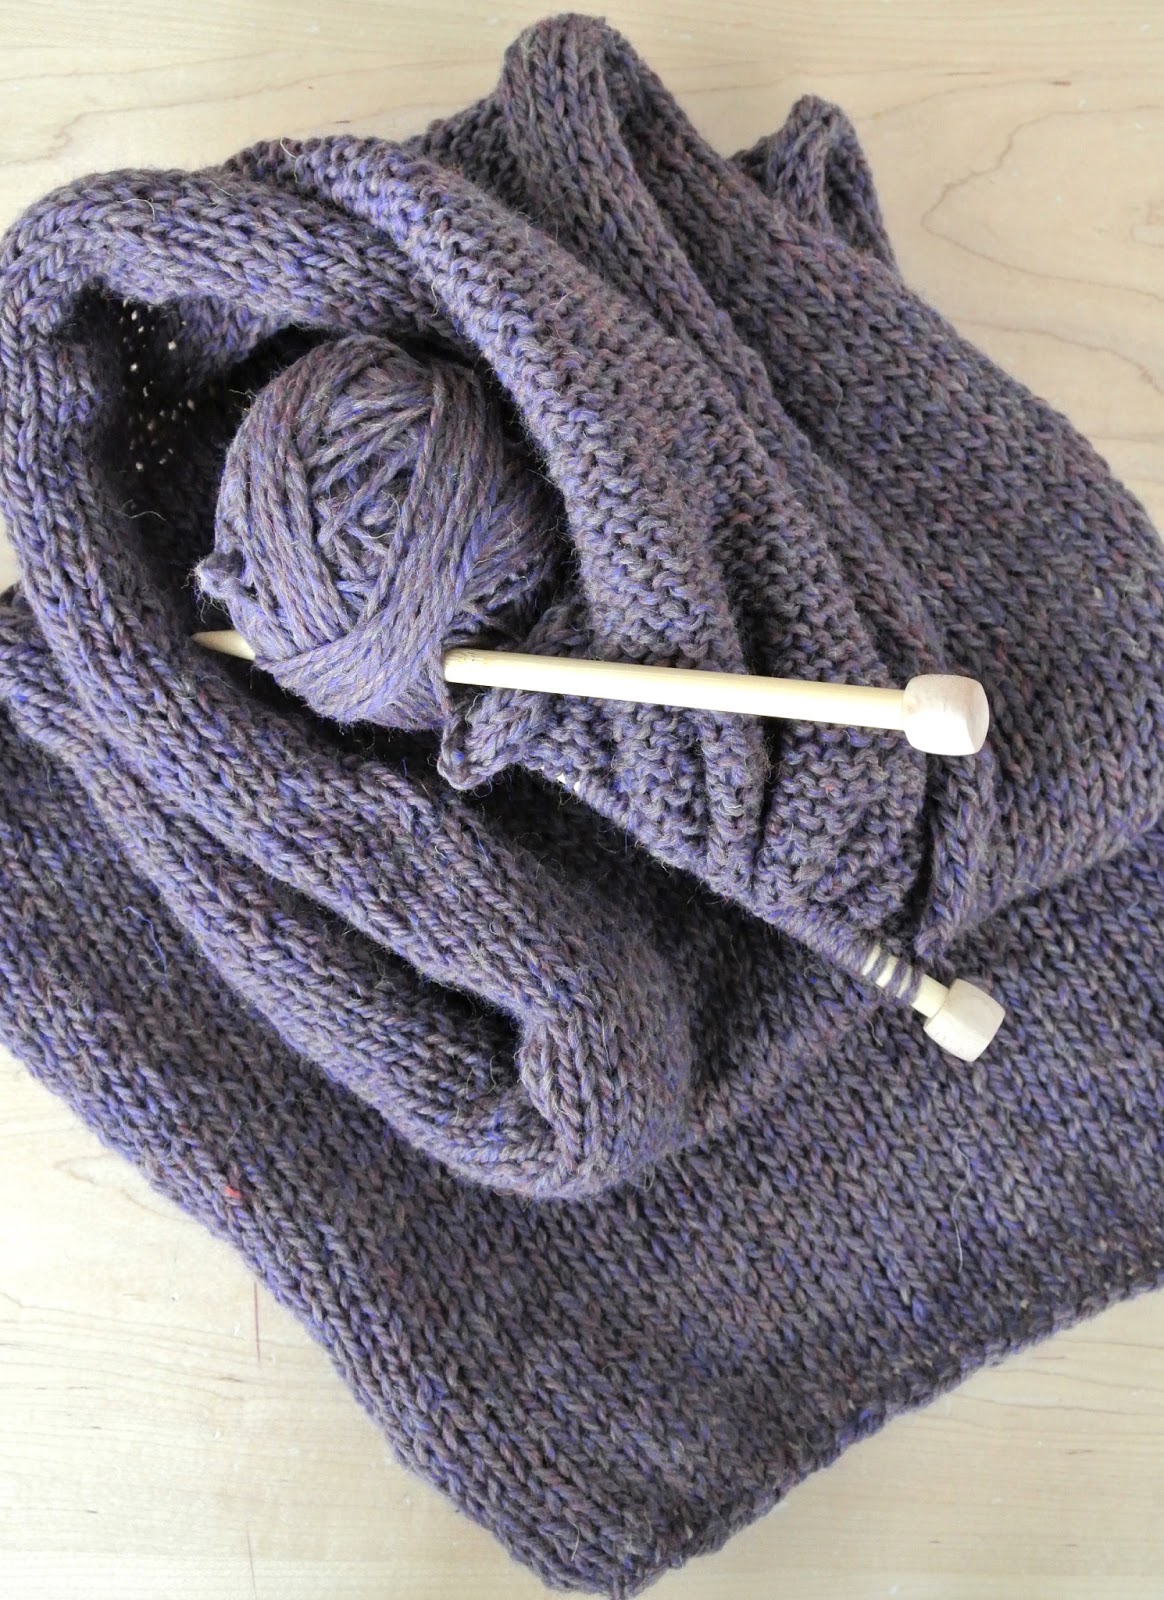 Knitting Stitches Stockinette Stitch : Knit Infinity Scarf